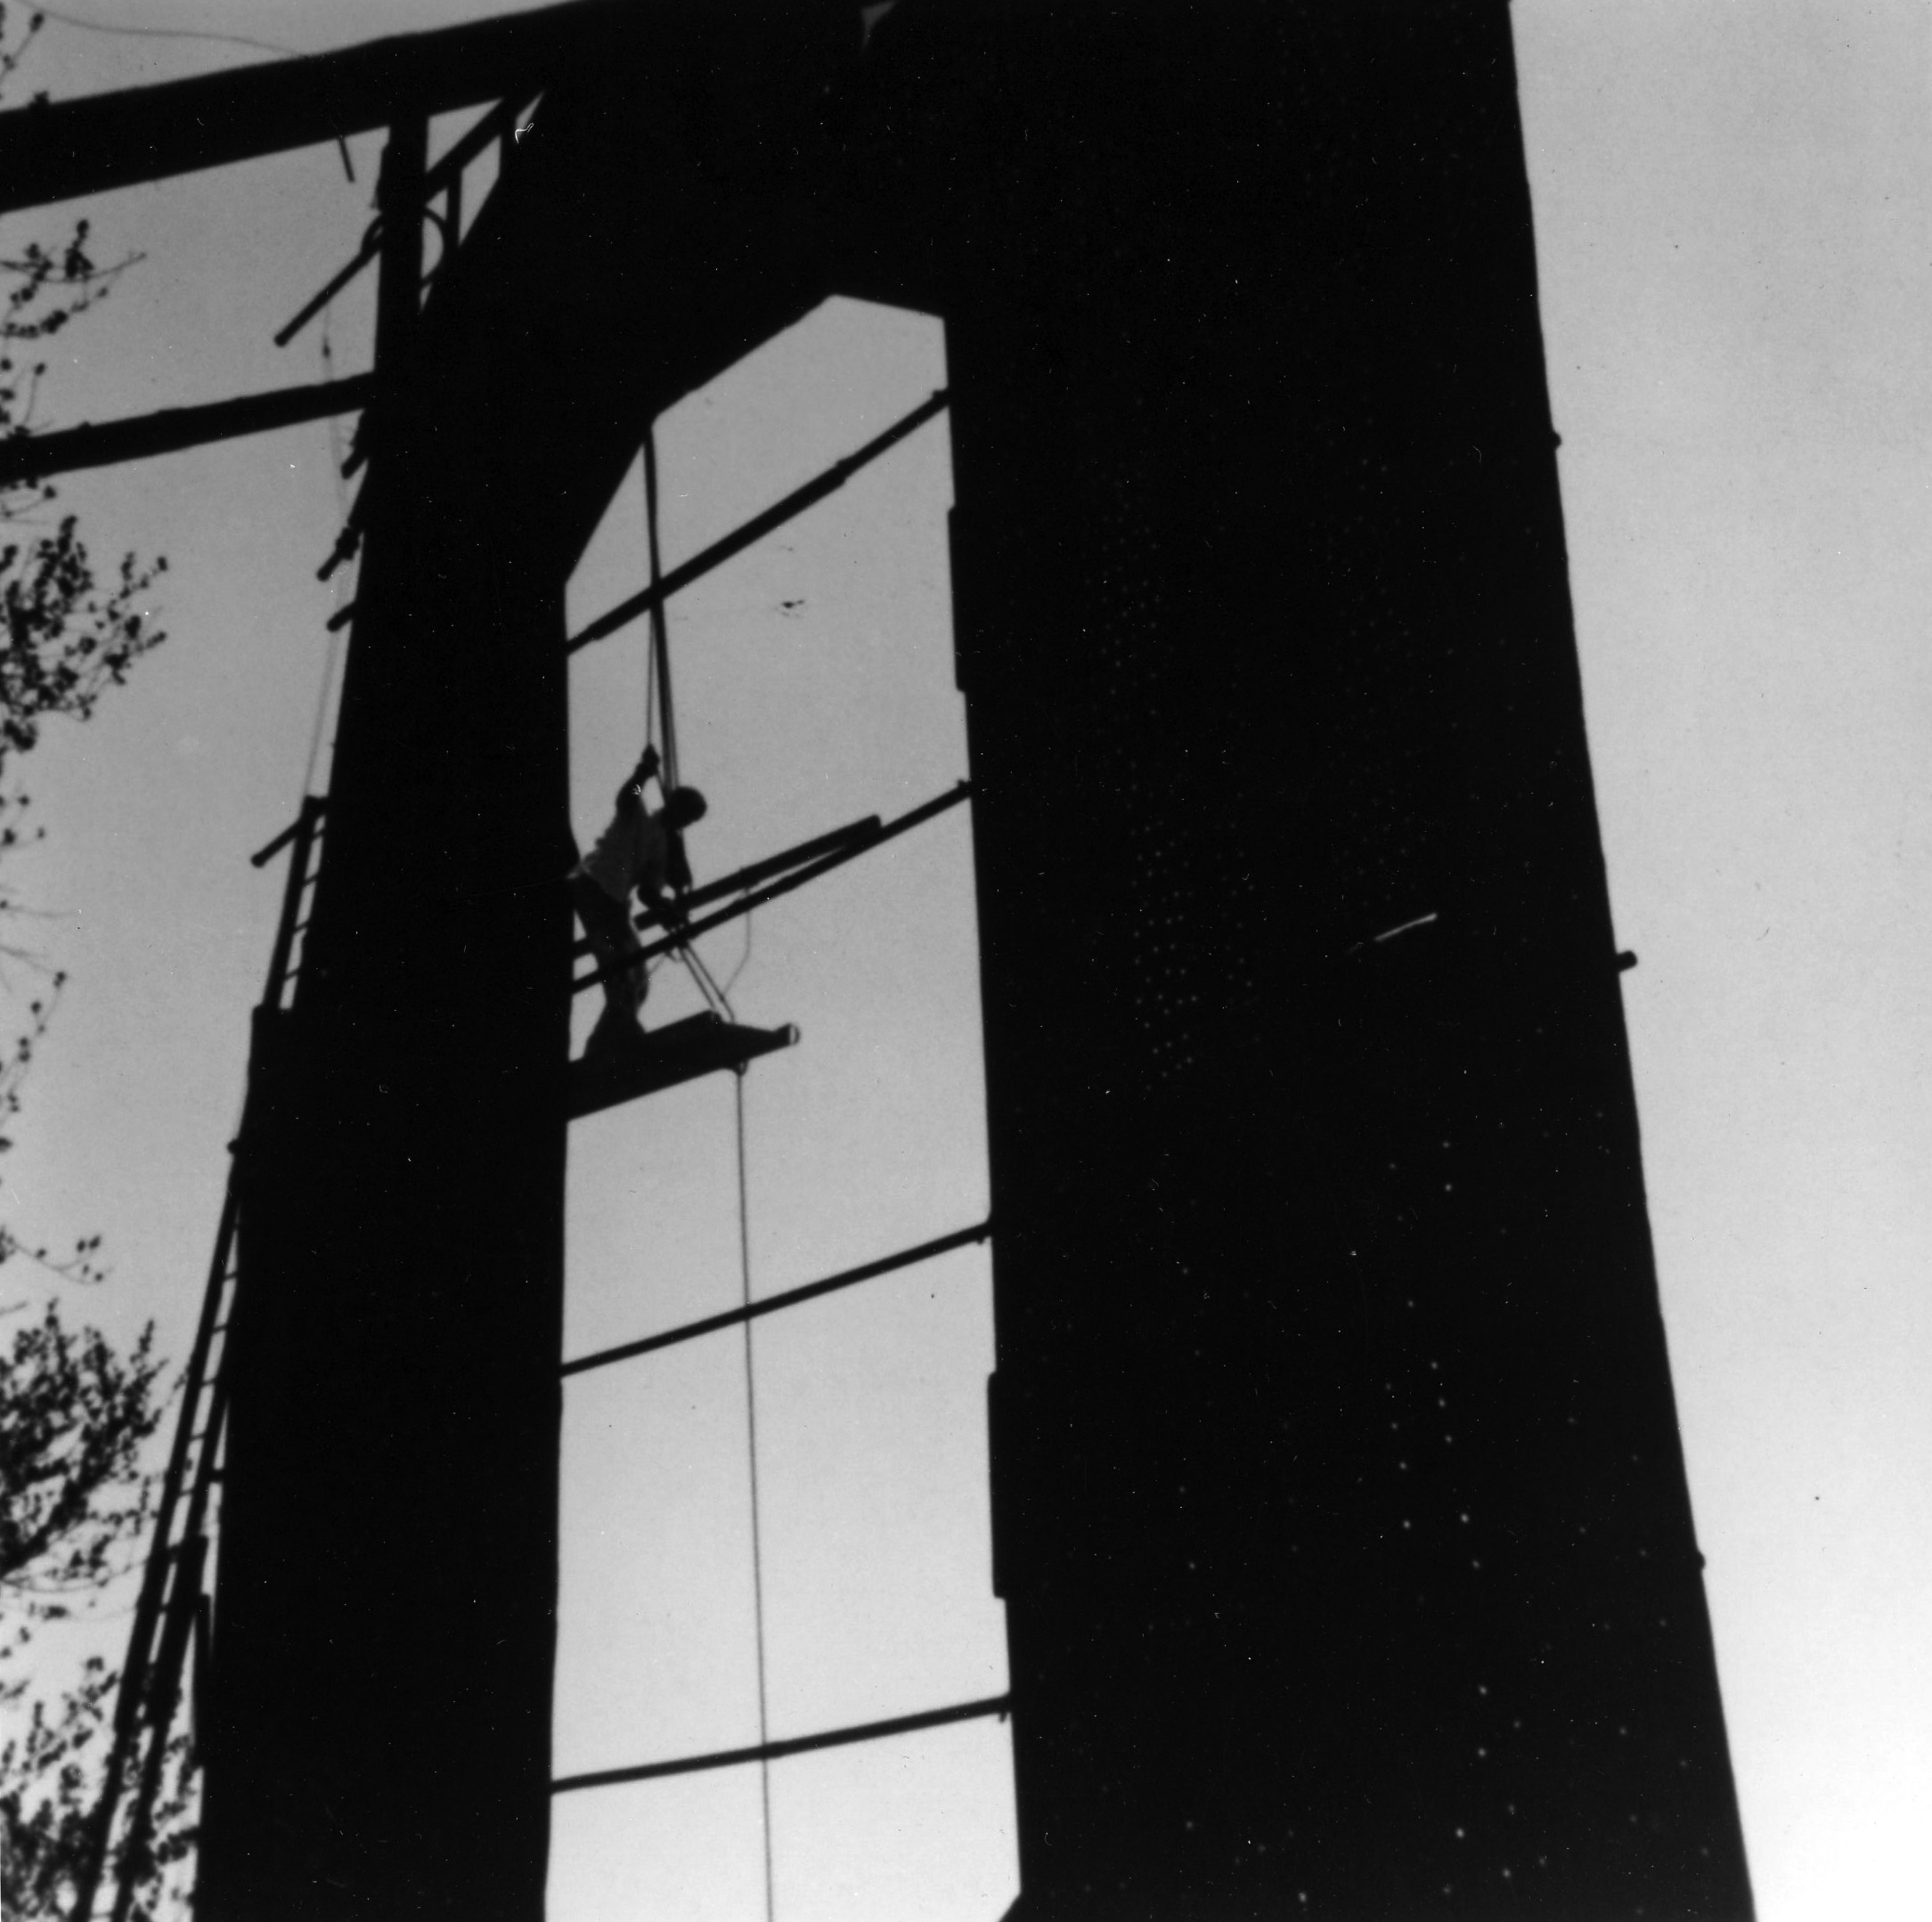 Refurbishing the Hollywood sign, 1973.